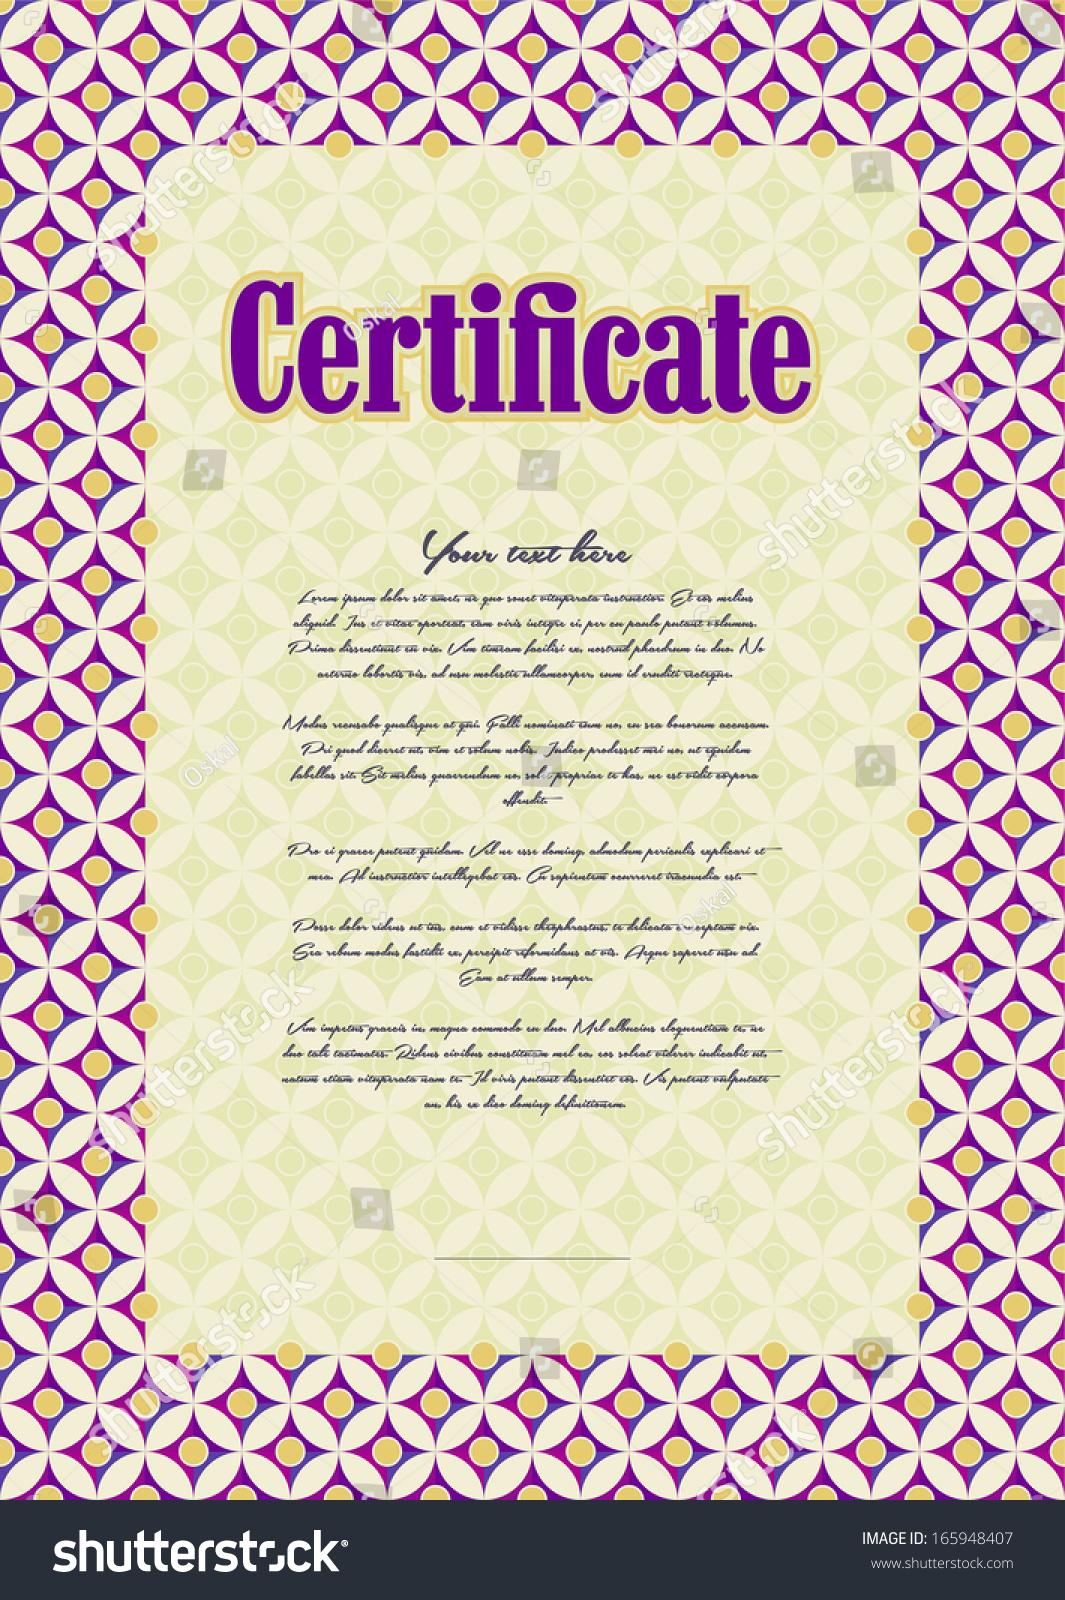 Basis Creating Certificate Diploma T Voucher Stock